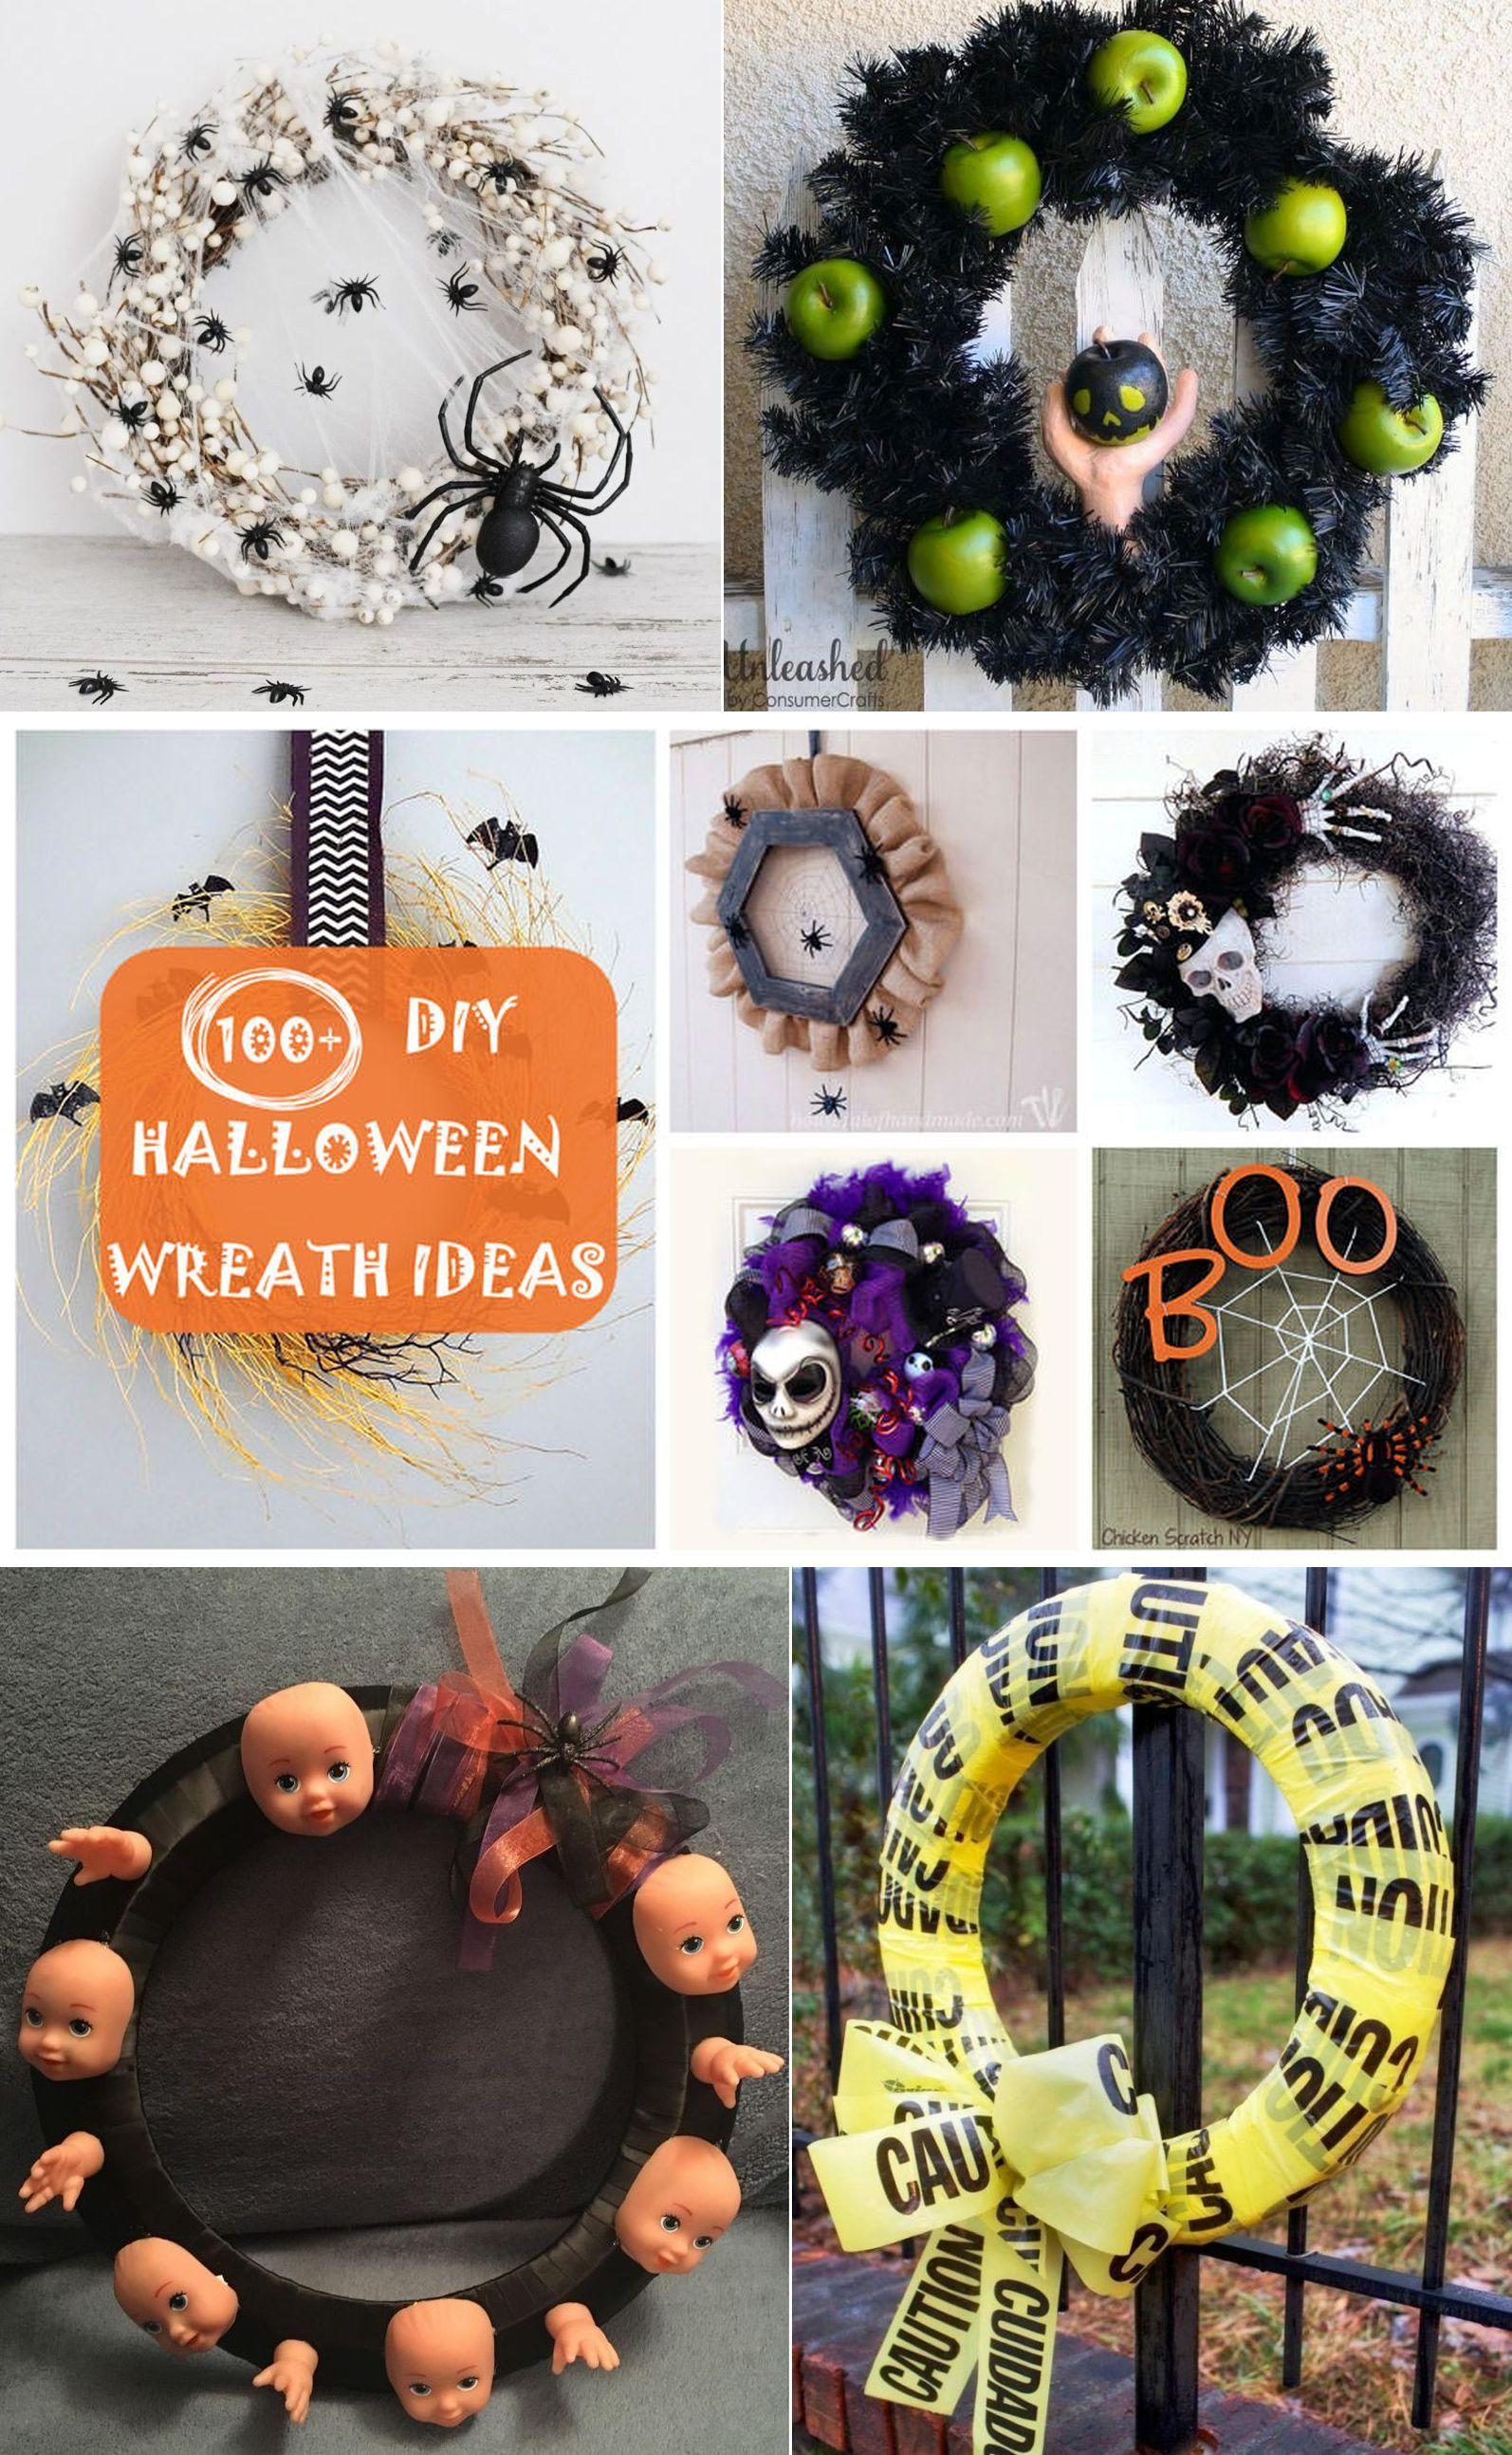 100 Best Diy Halloween Wreath Ideas To Try In 2019 Halloween